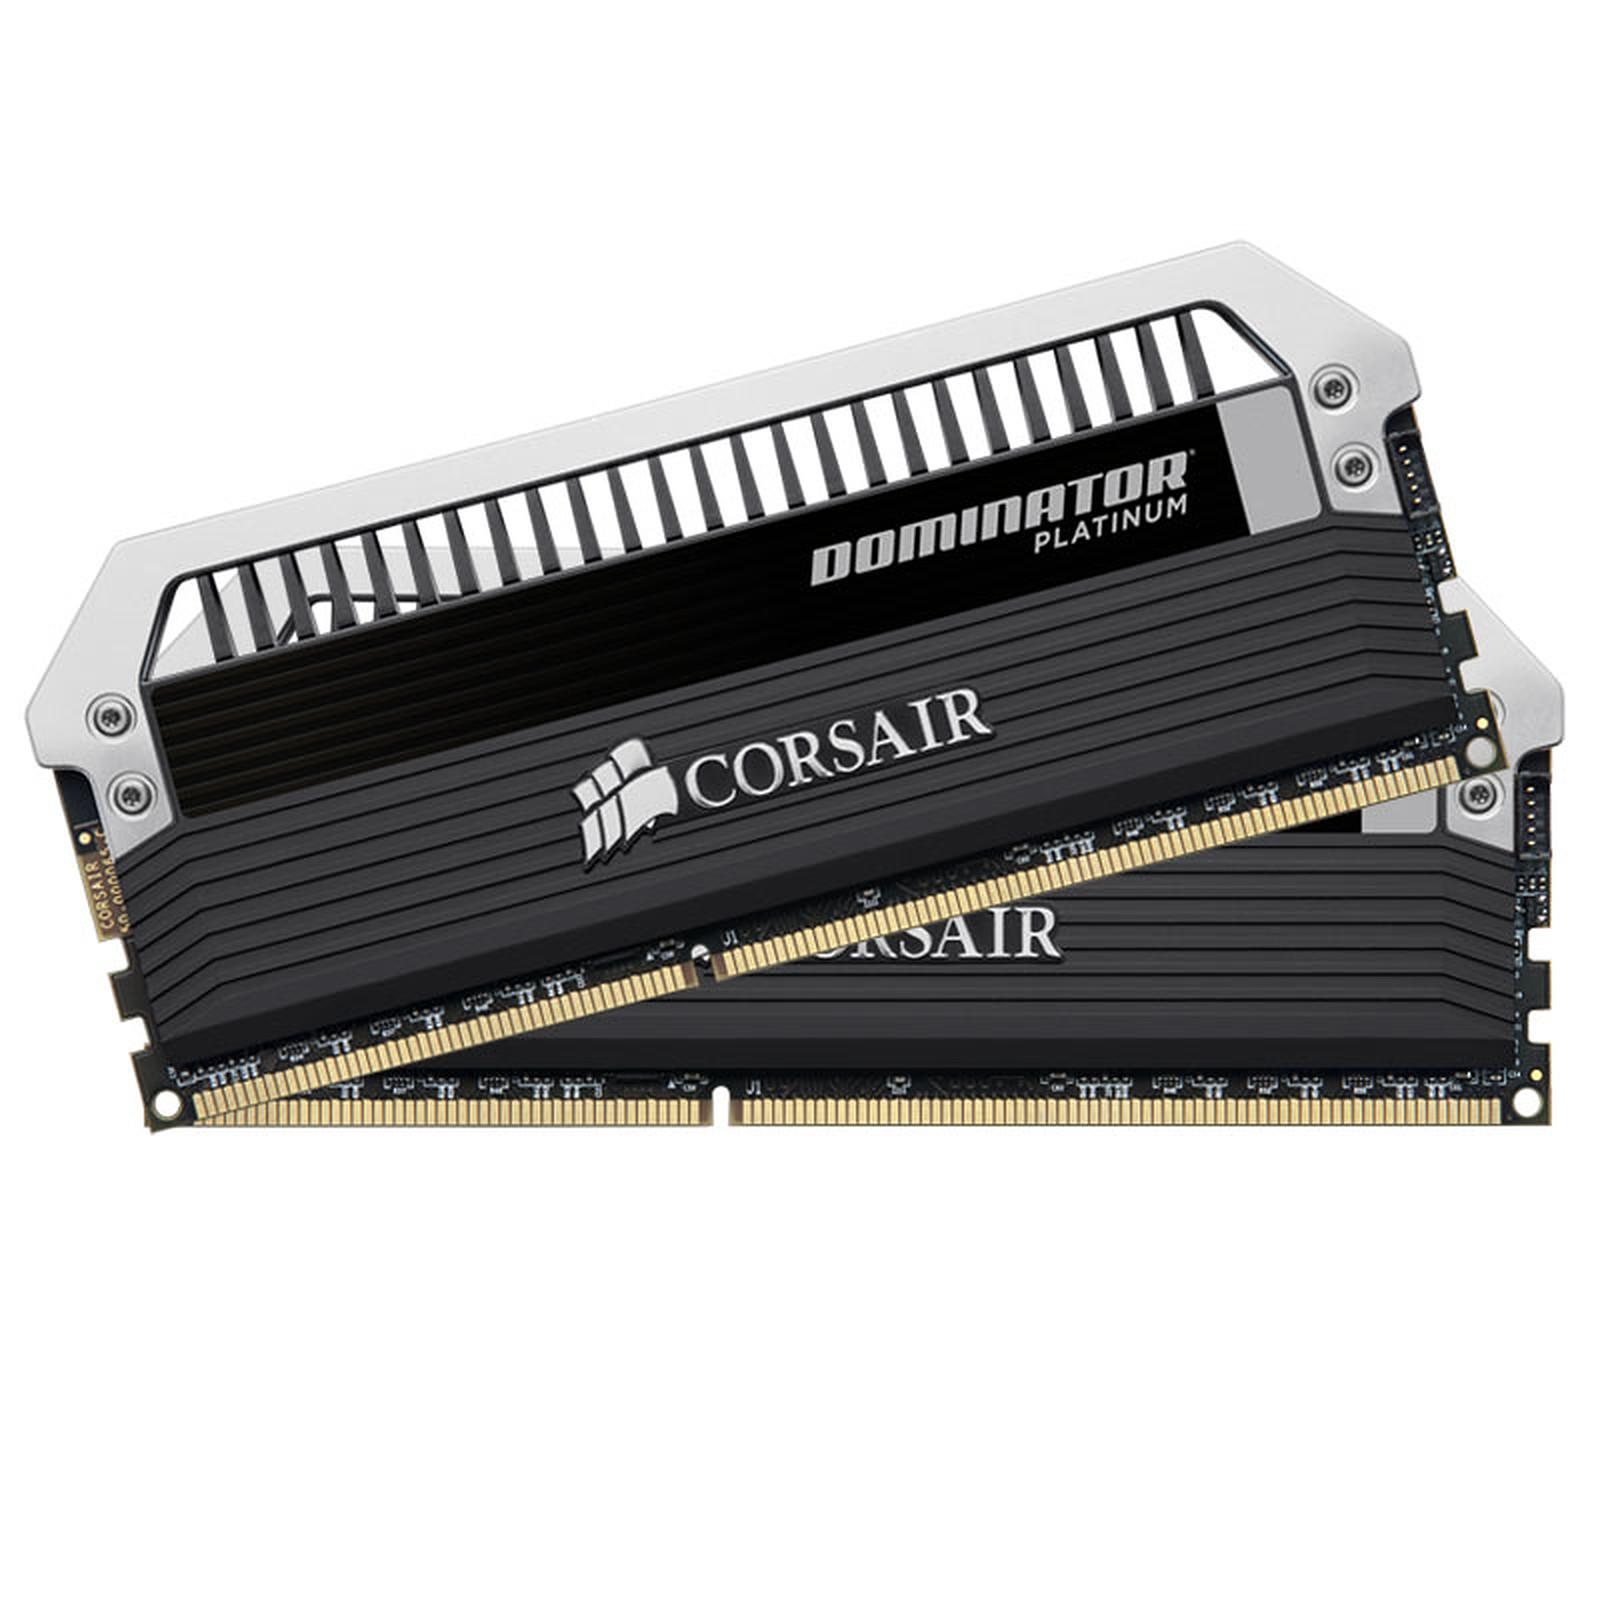 Corsair Dominator Platinum 8 Go (2 x 4 Go) DDR3 2133 MHz CL8